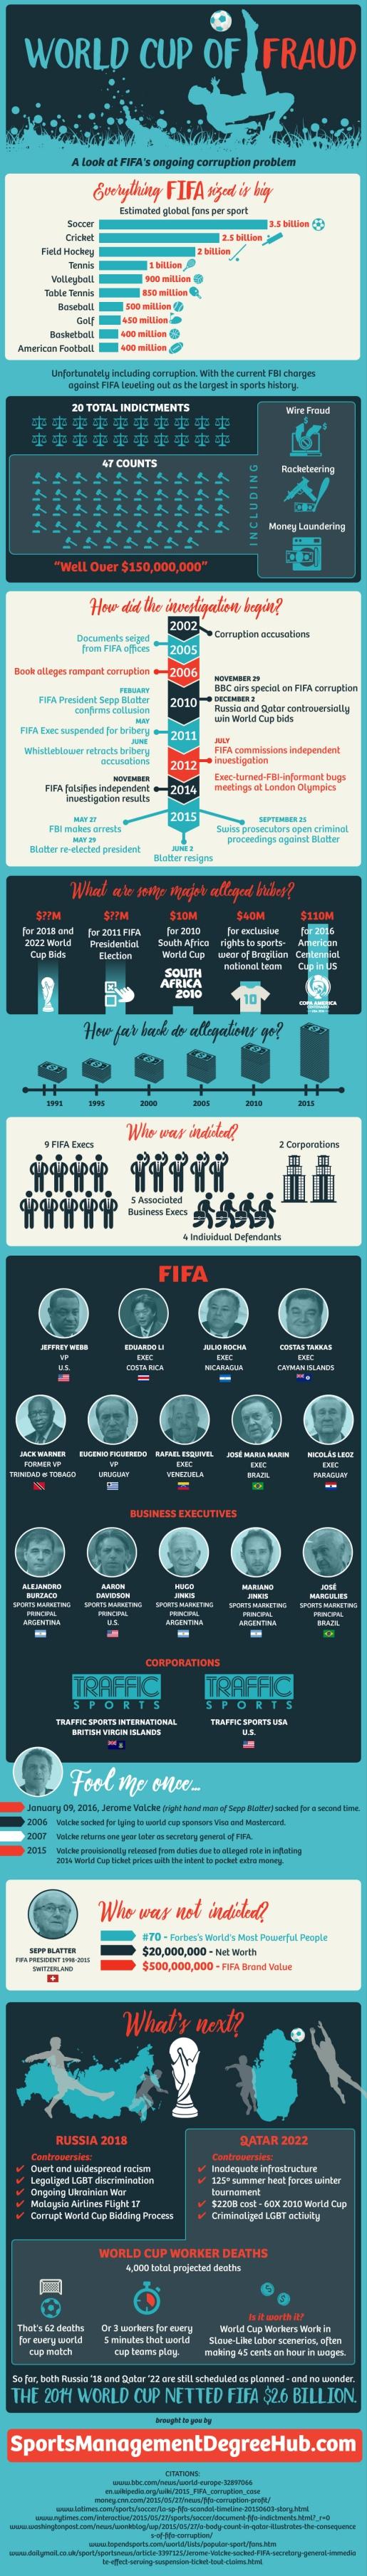 FIFA-ig sportmanagementdegreehub